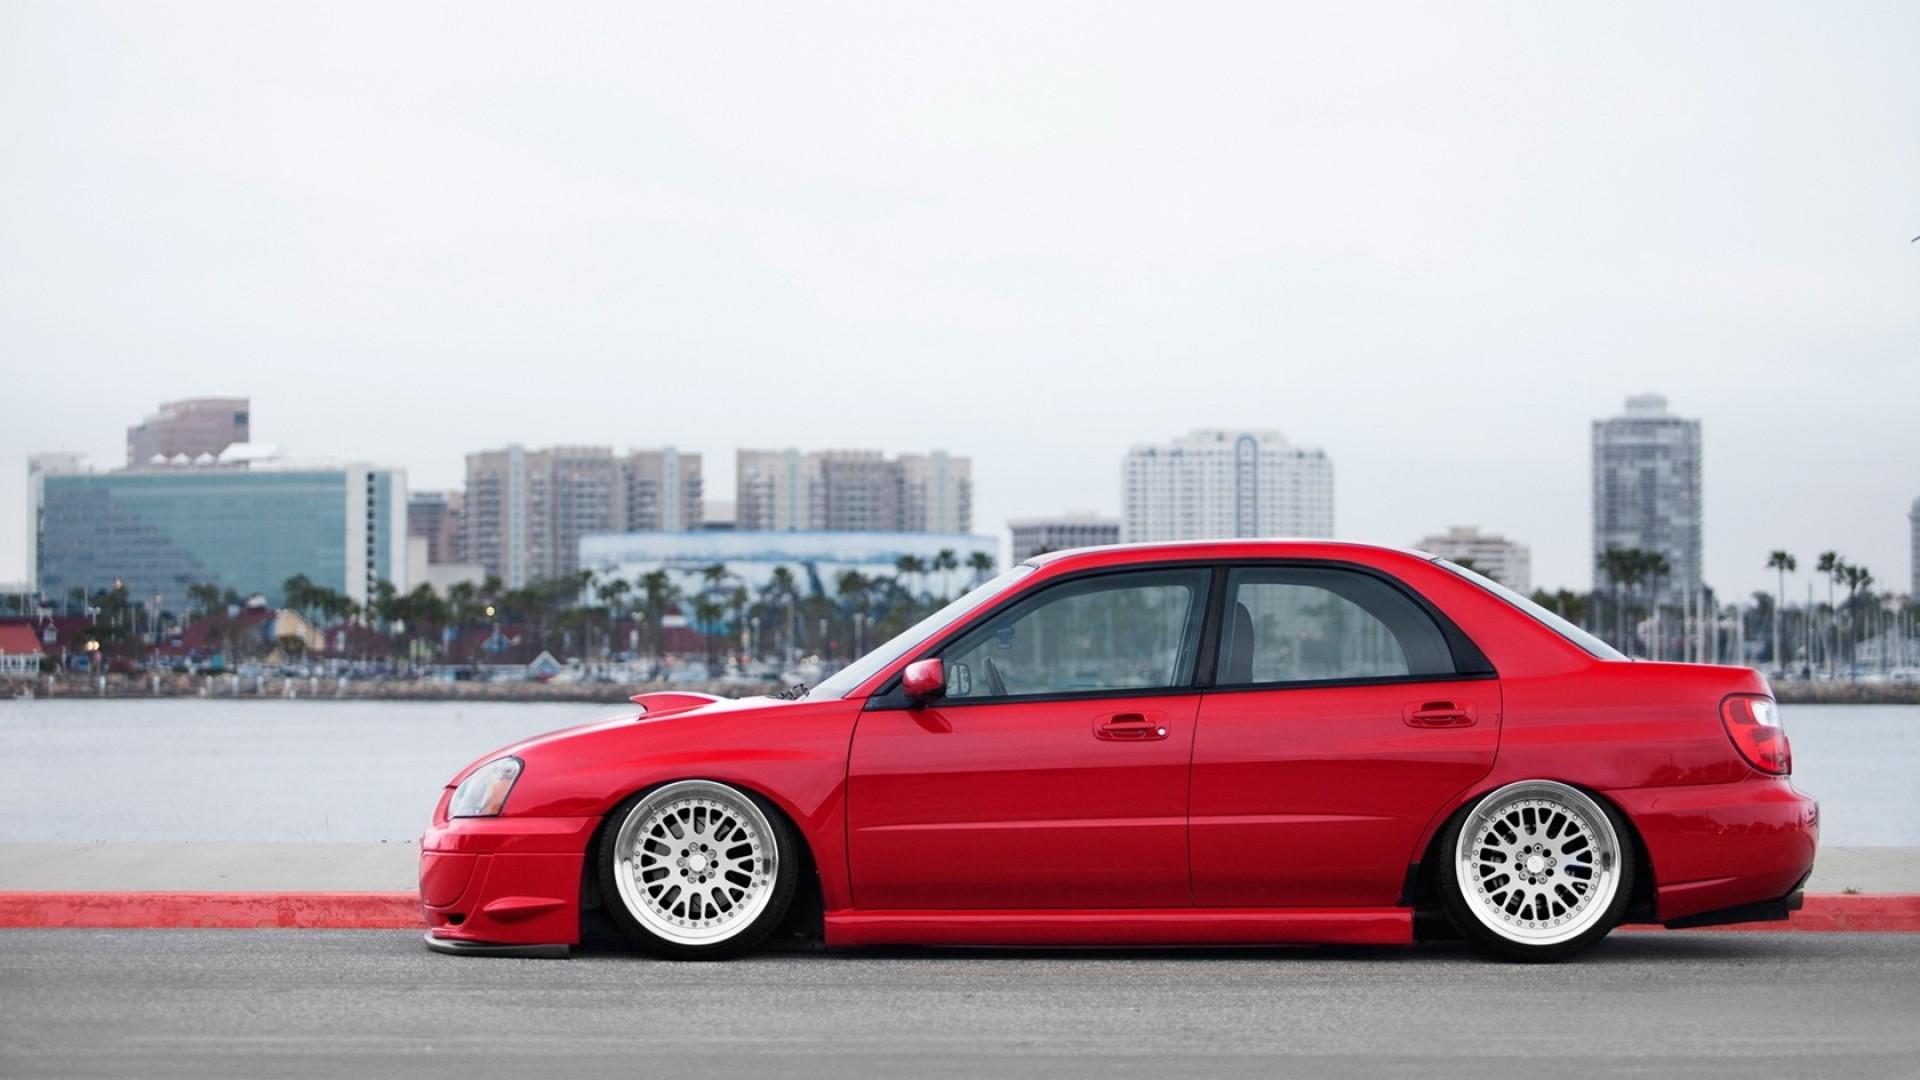 Wallpaper Red Cars Sports Car Subaru Impreza Wrx Sti Stance